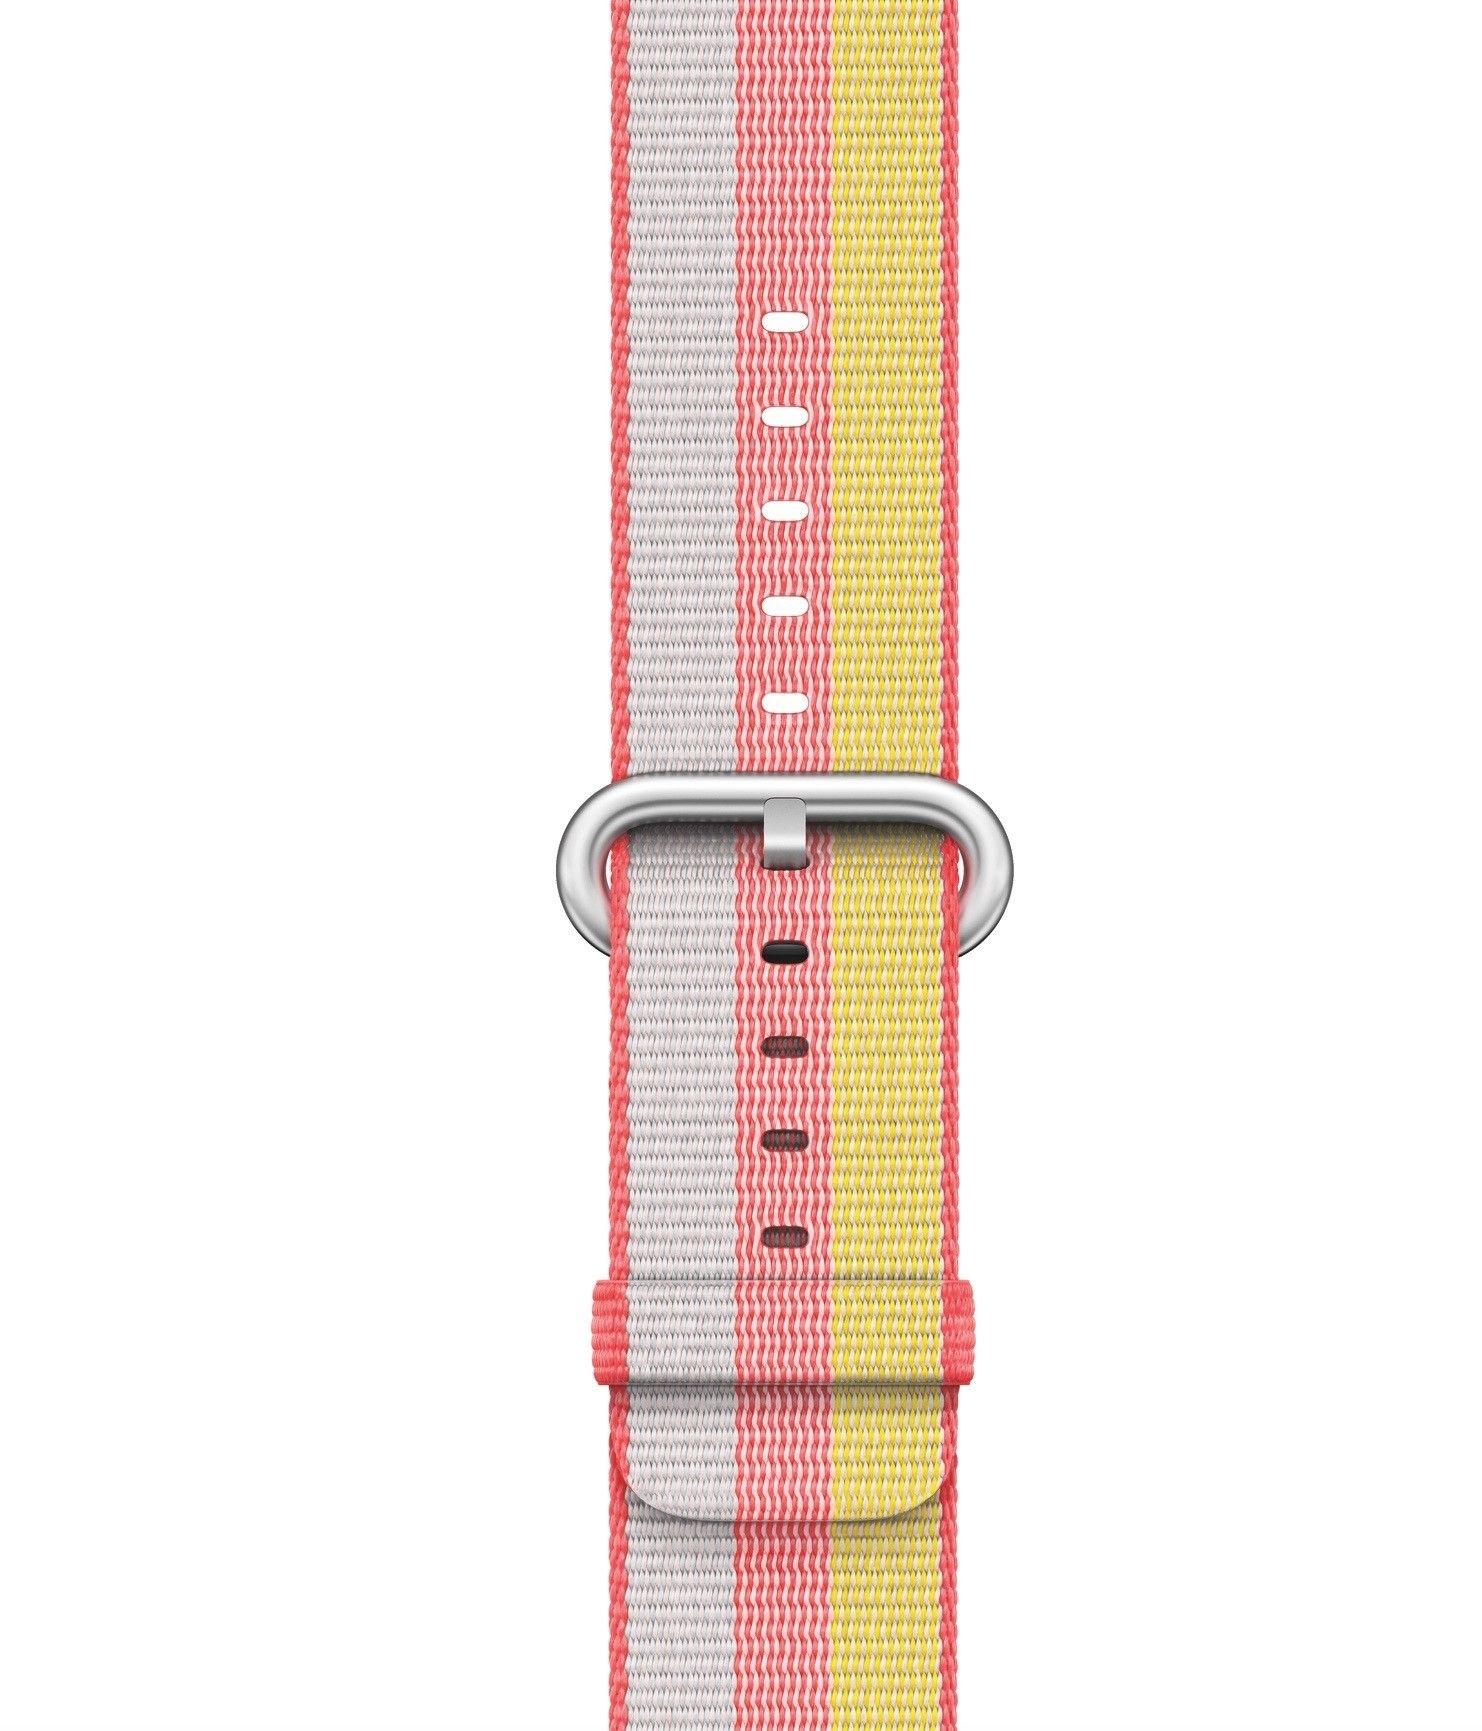 Apple Watch bandje van geweven nylon rood  SHOP ONLINE: https://www.purelifestyle.be/apple-watch-bandje-van-geweven-nylon-rood.html